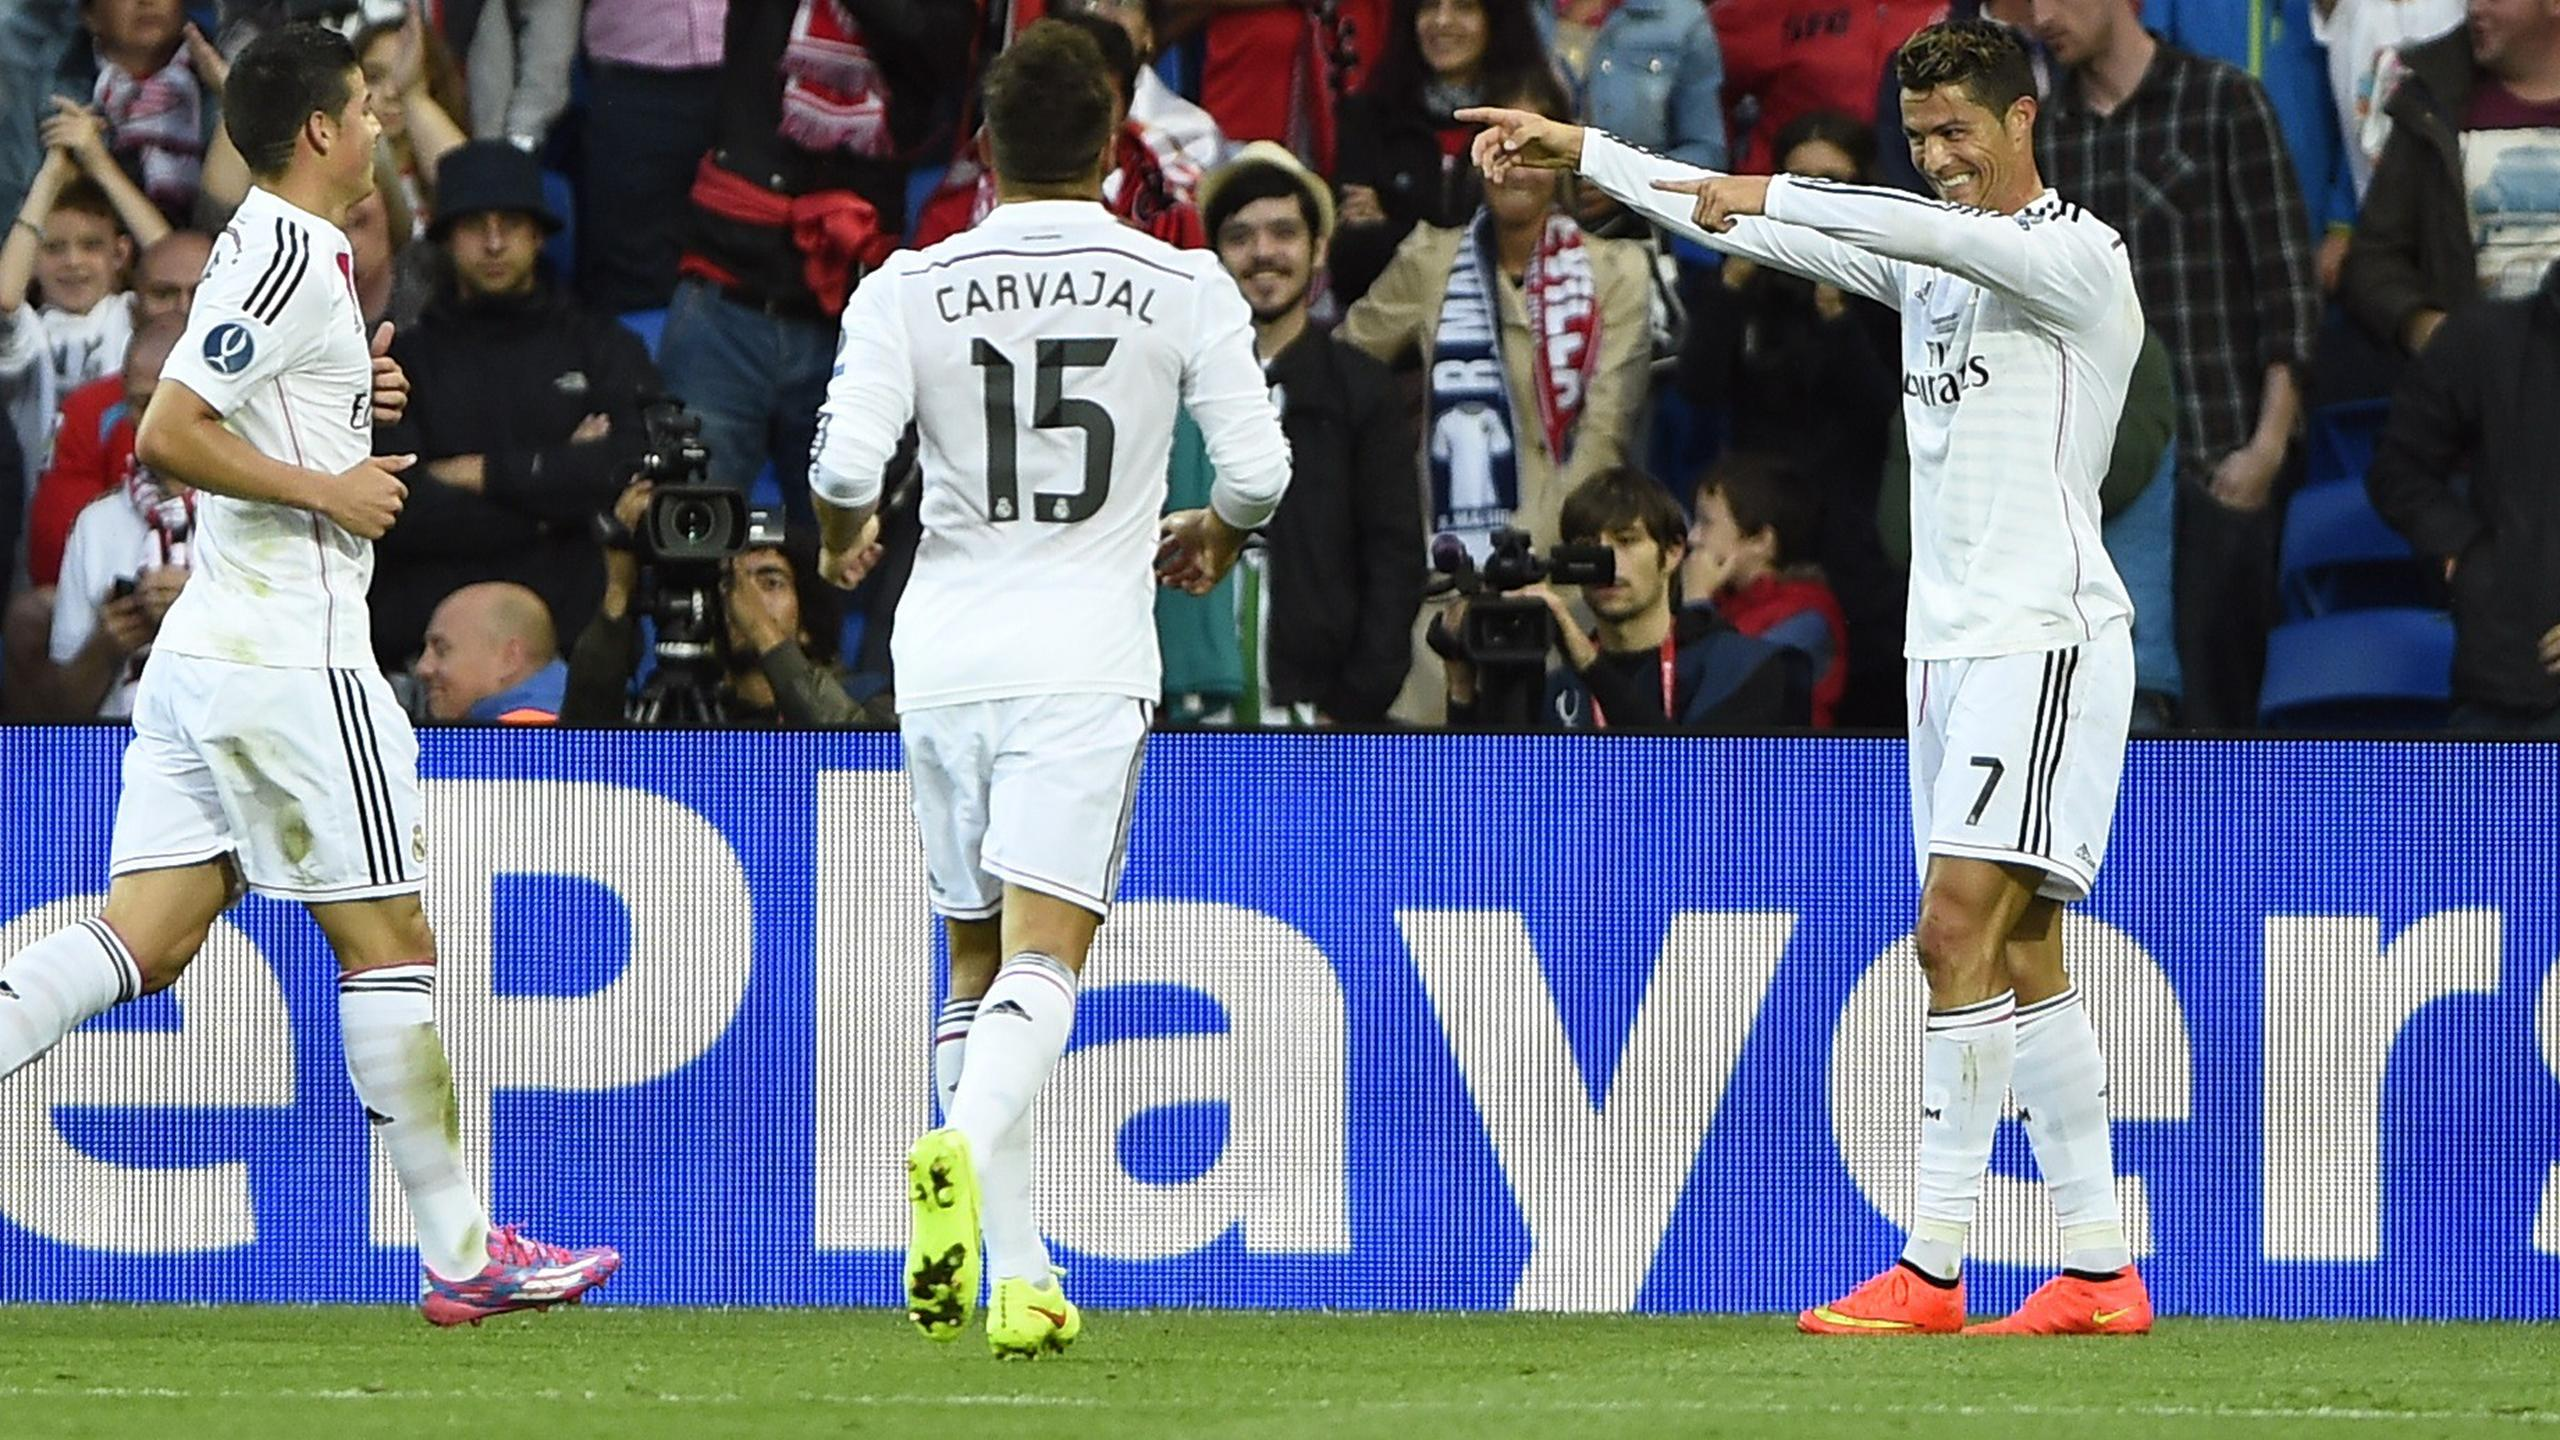 European Super Cup - Ronaldo double sees Madrid easily overcome Sevilla